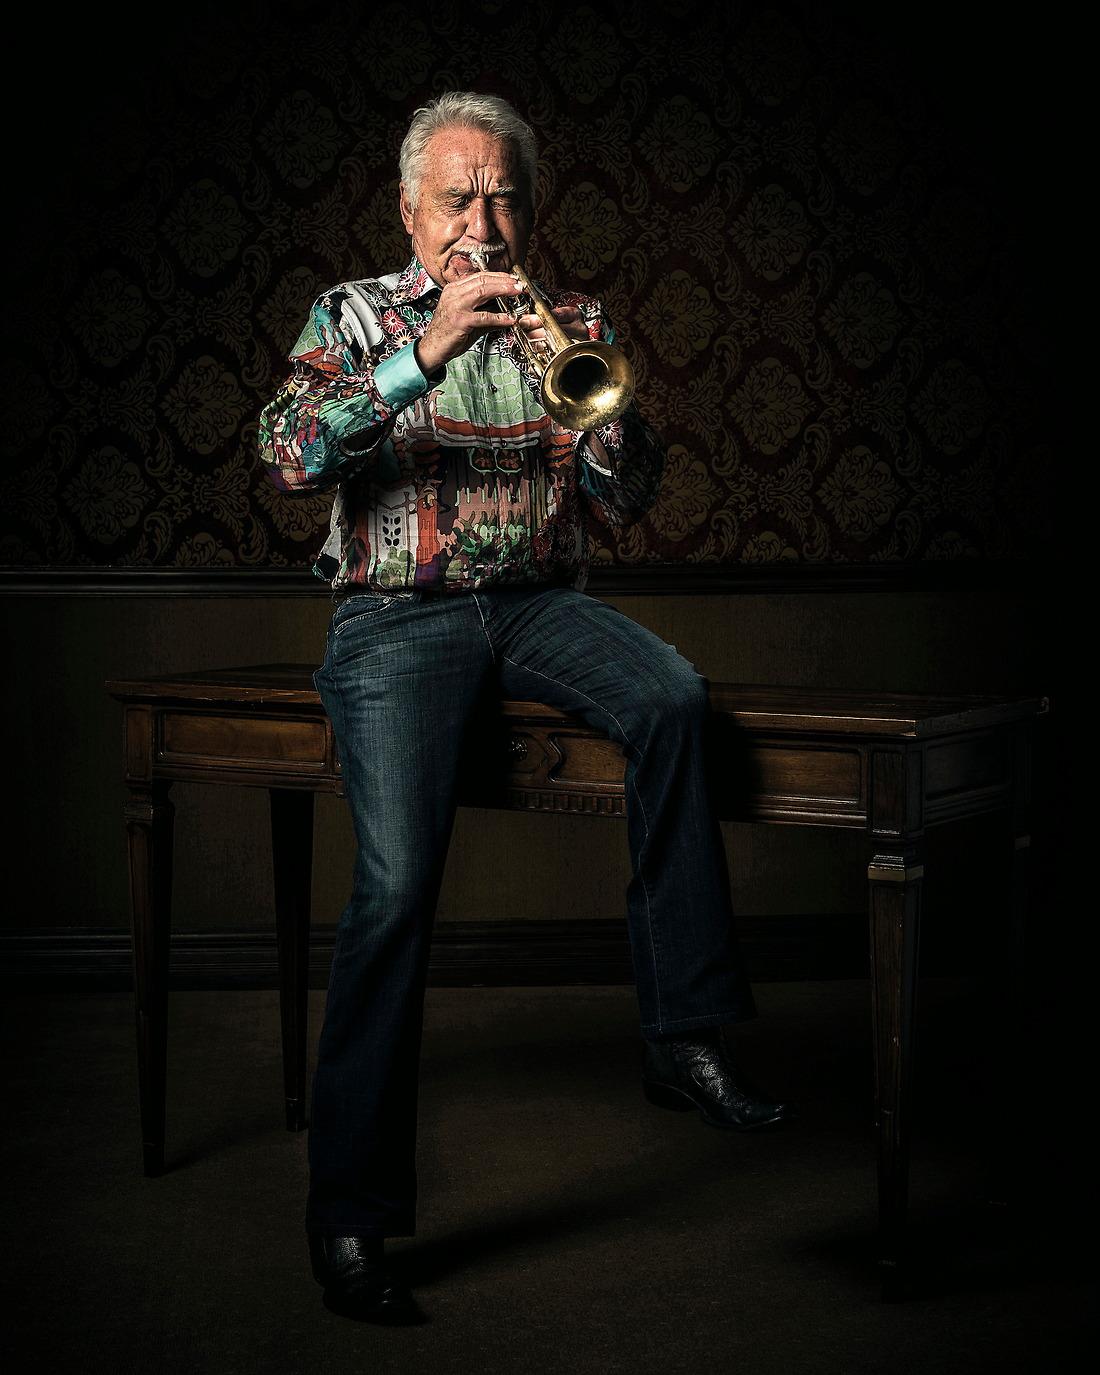 Doc Severinsen Tonight Show Band Leader and Legendary Jazz Artist. — © Jeremy Lock/